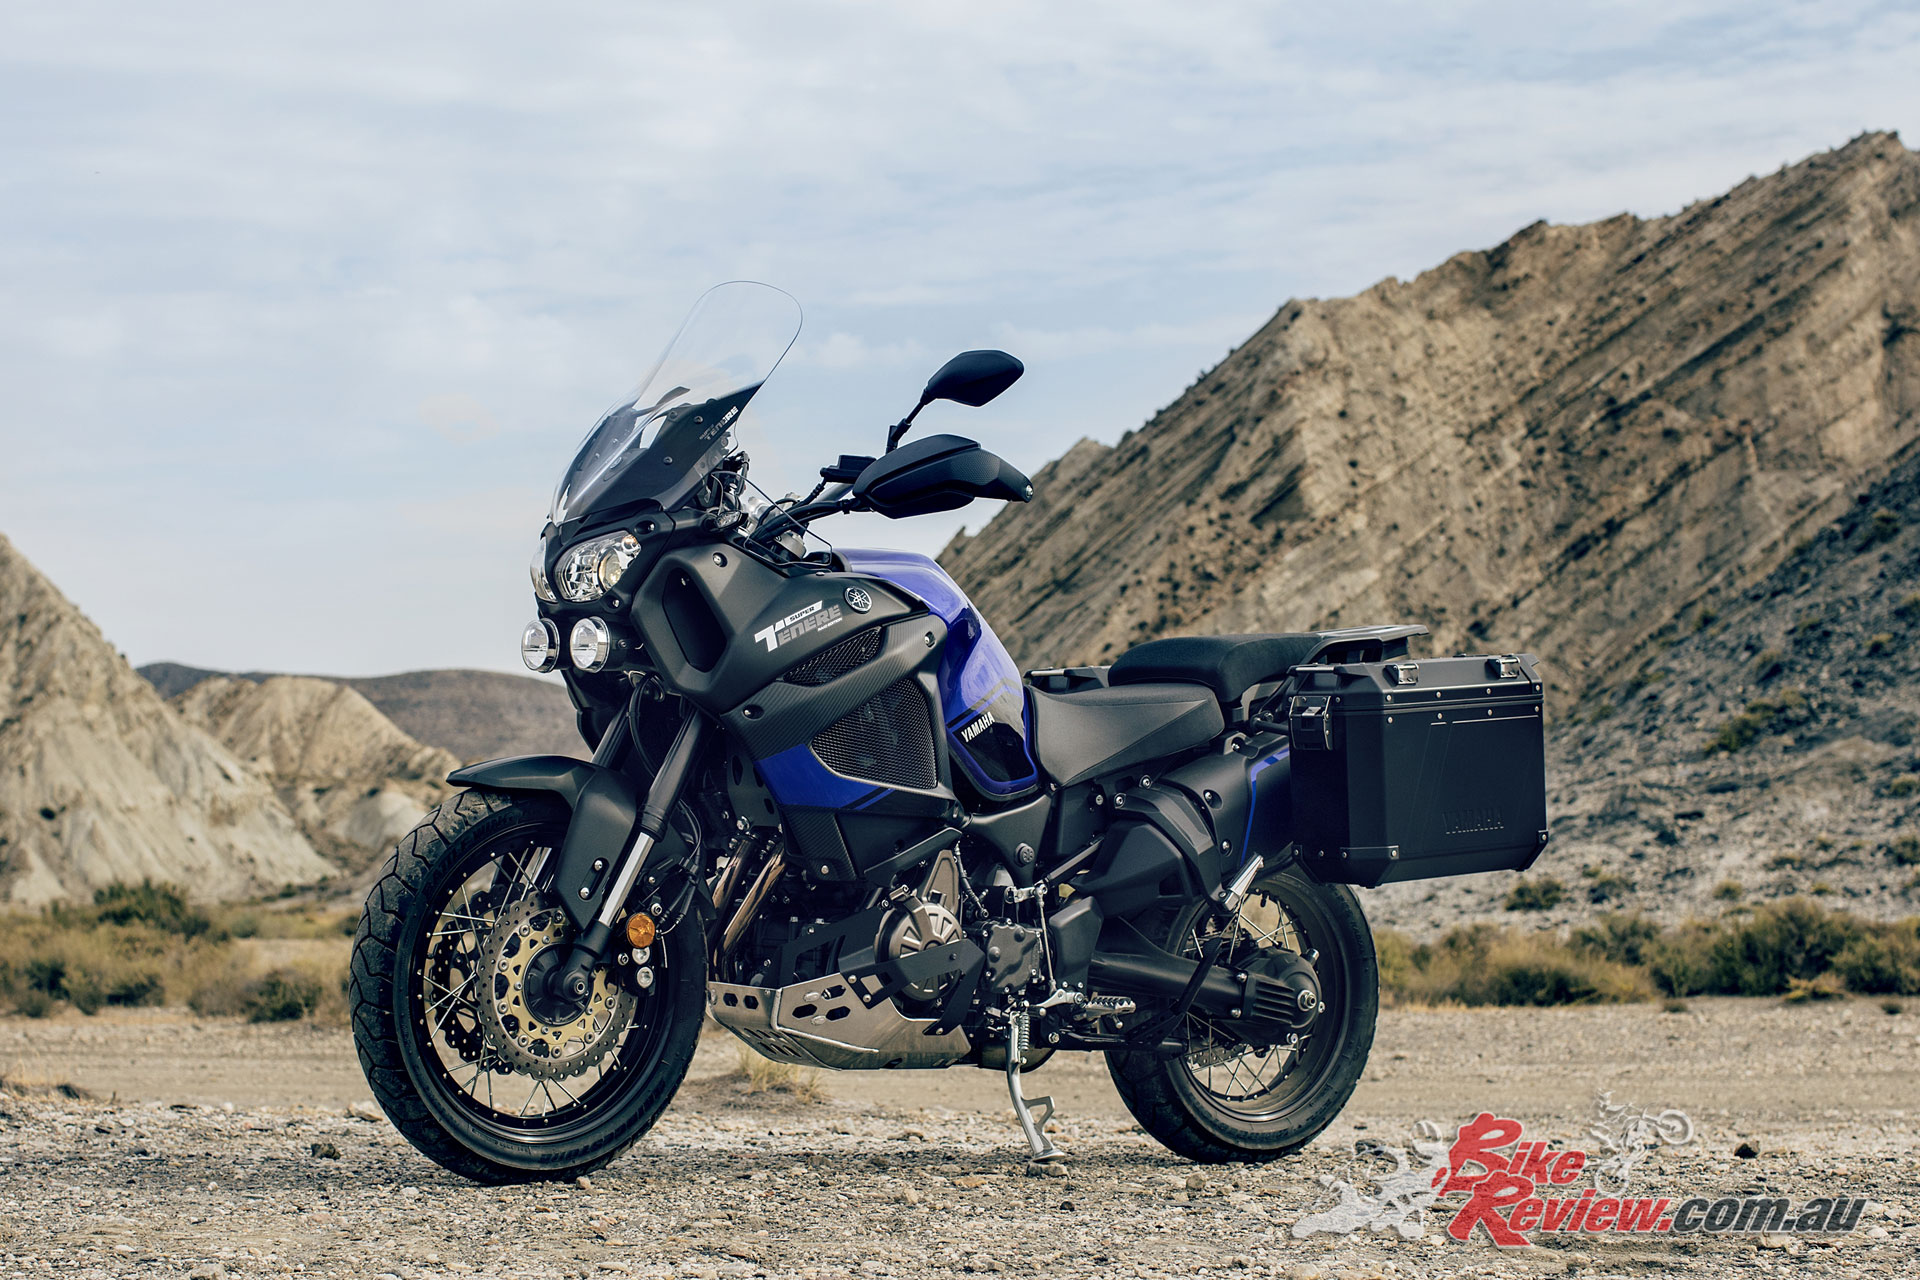 2018 Yamaha Super Tenere Raid Edition Amp Updated Yzf R1m Bike Review